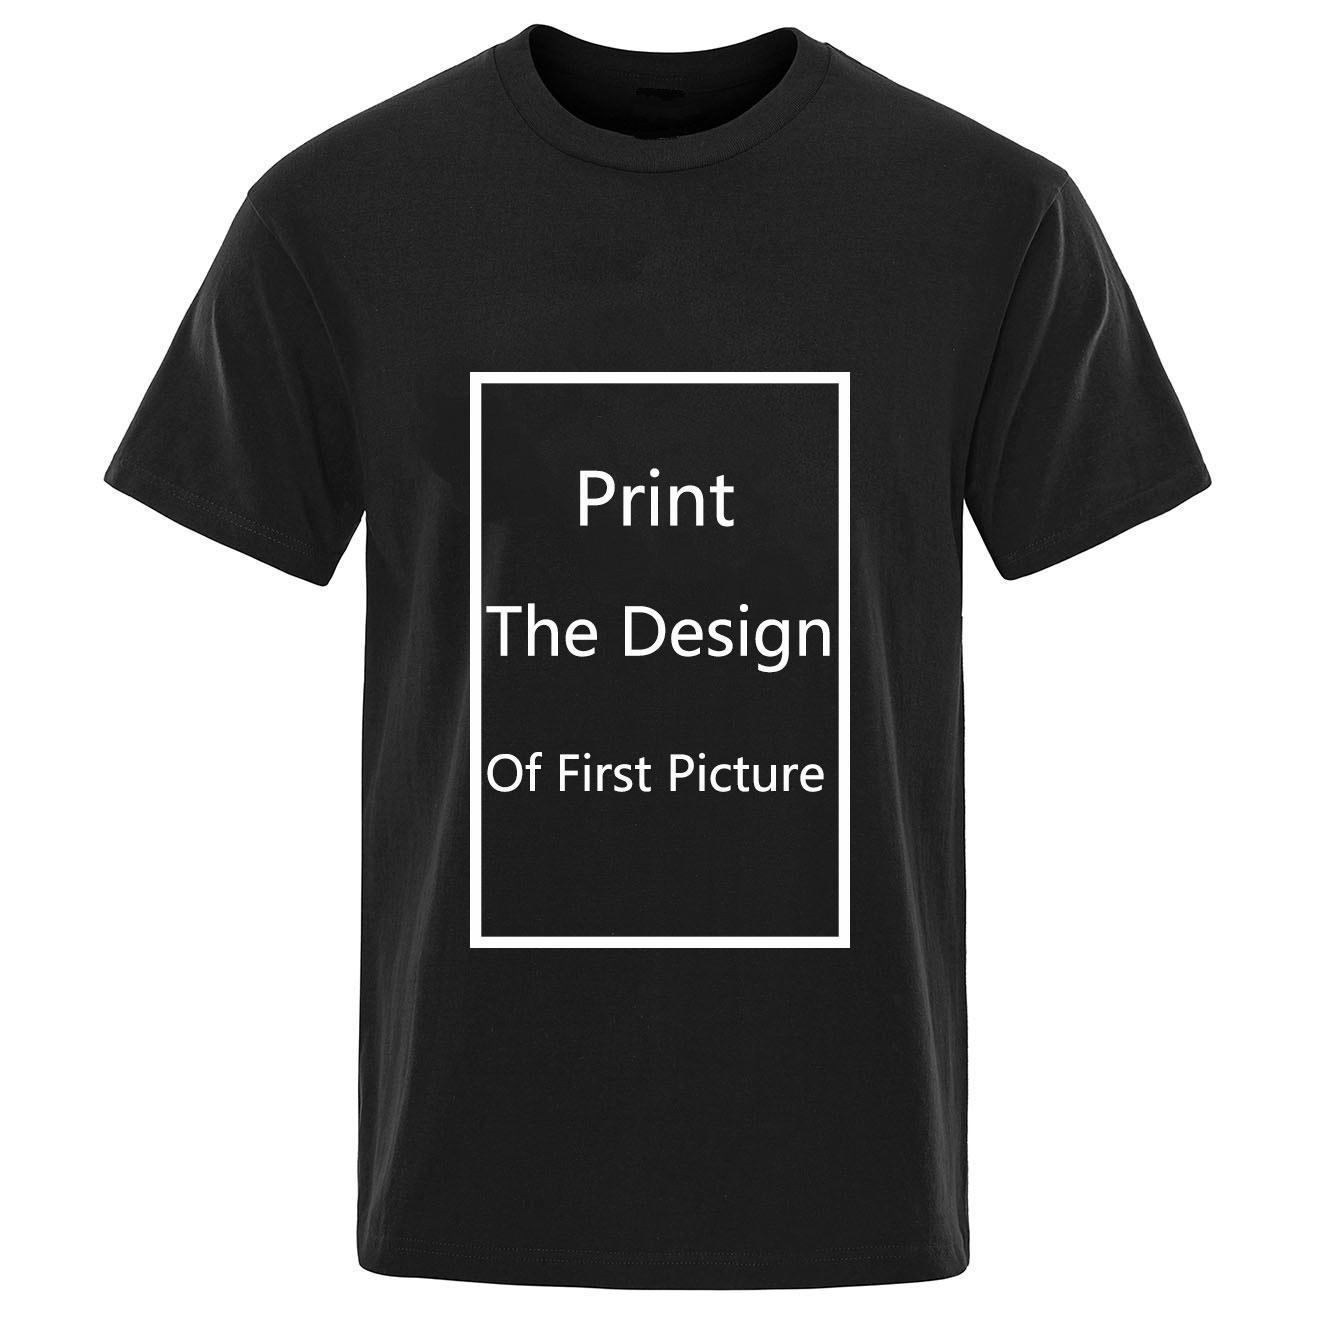 T Shirt Donkey Kong Vintage O Grande Off T-shirt Tees Onda de Kanagawa funky Kong Japanese Game Digital Imprimir Casual Camiseta